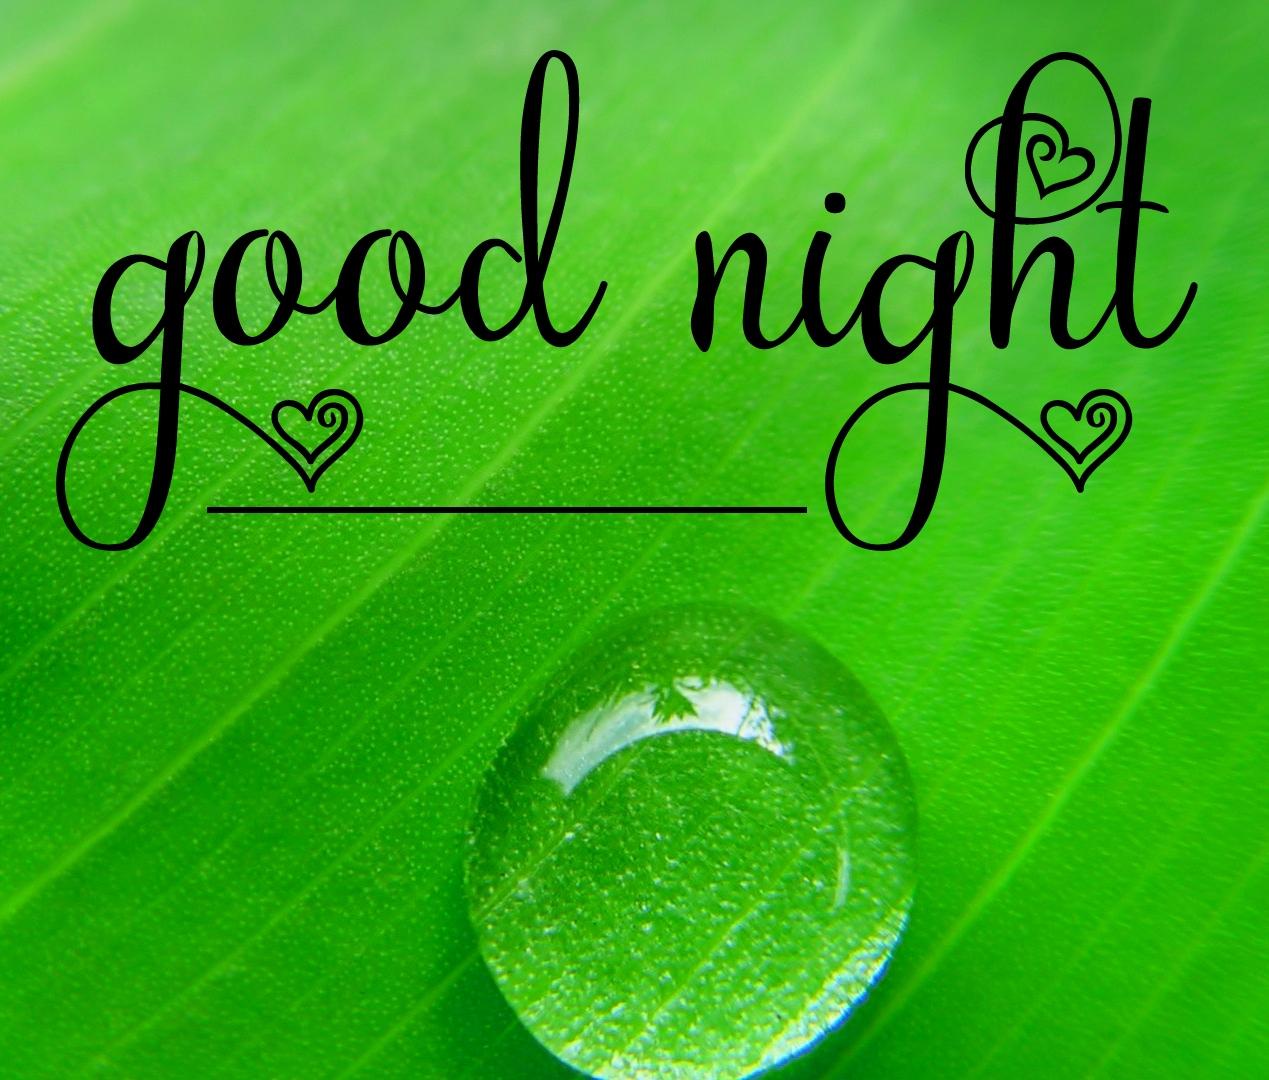 Free good night Images 22